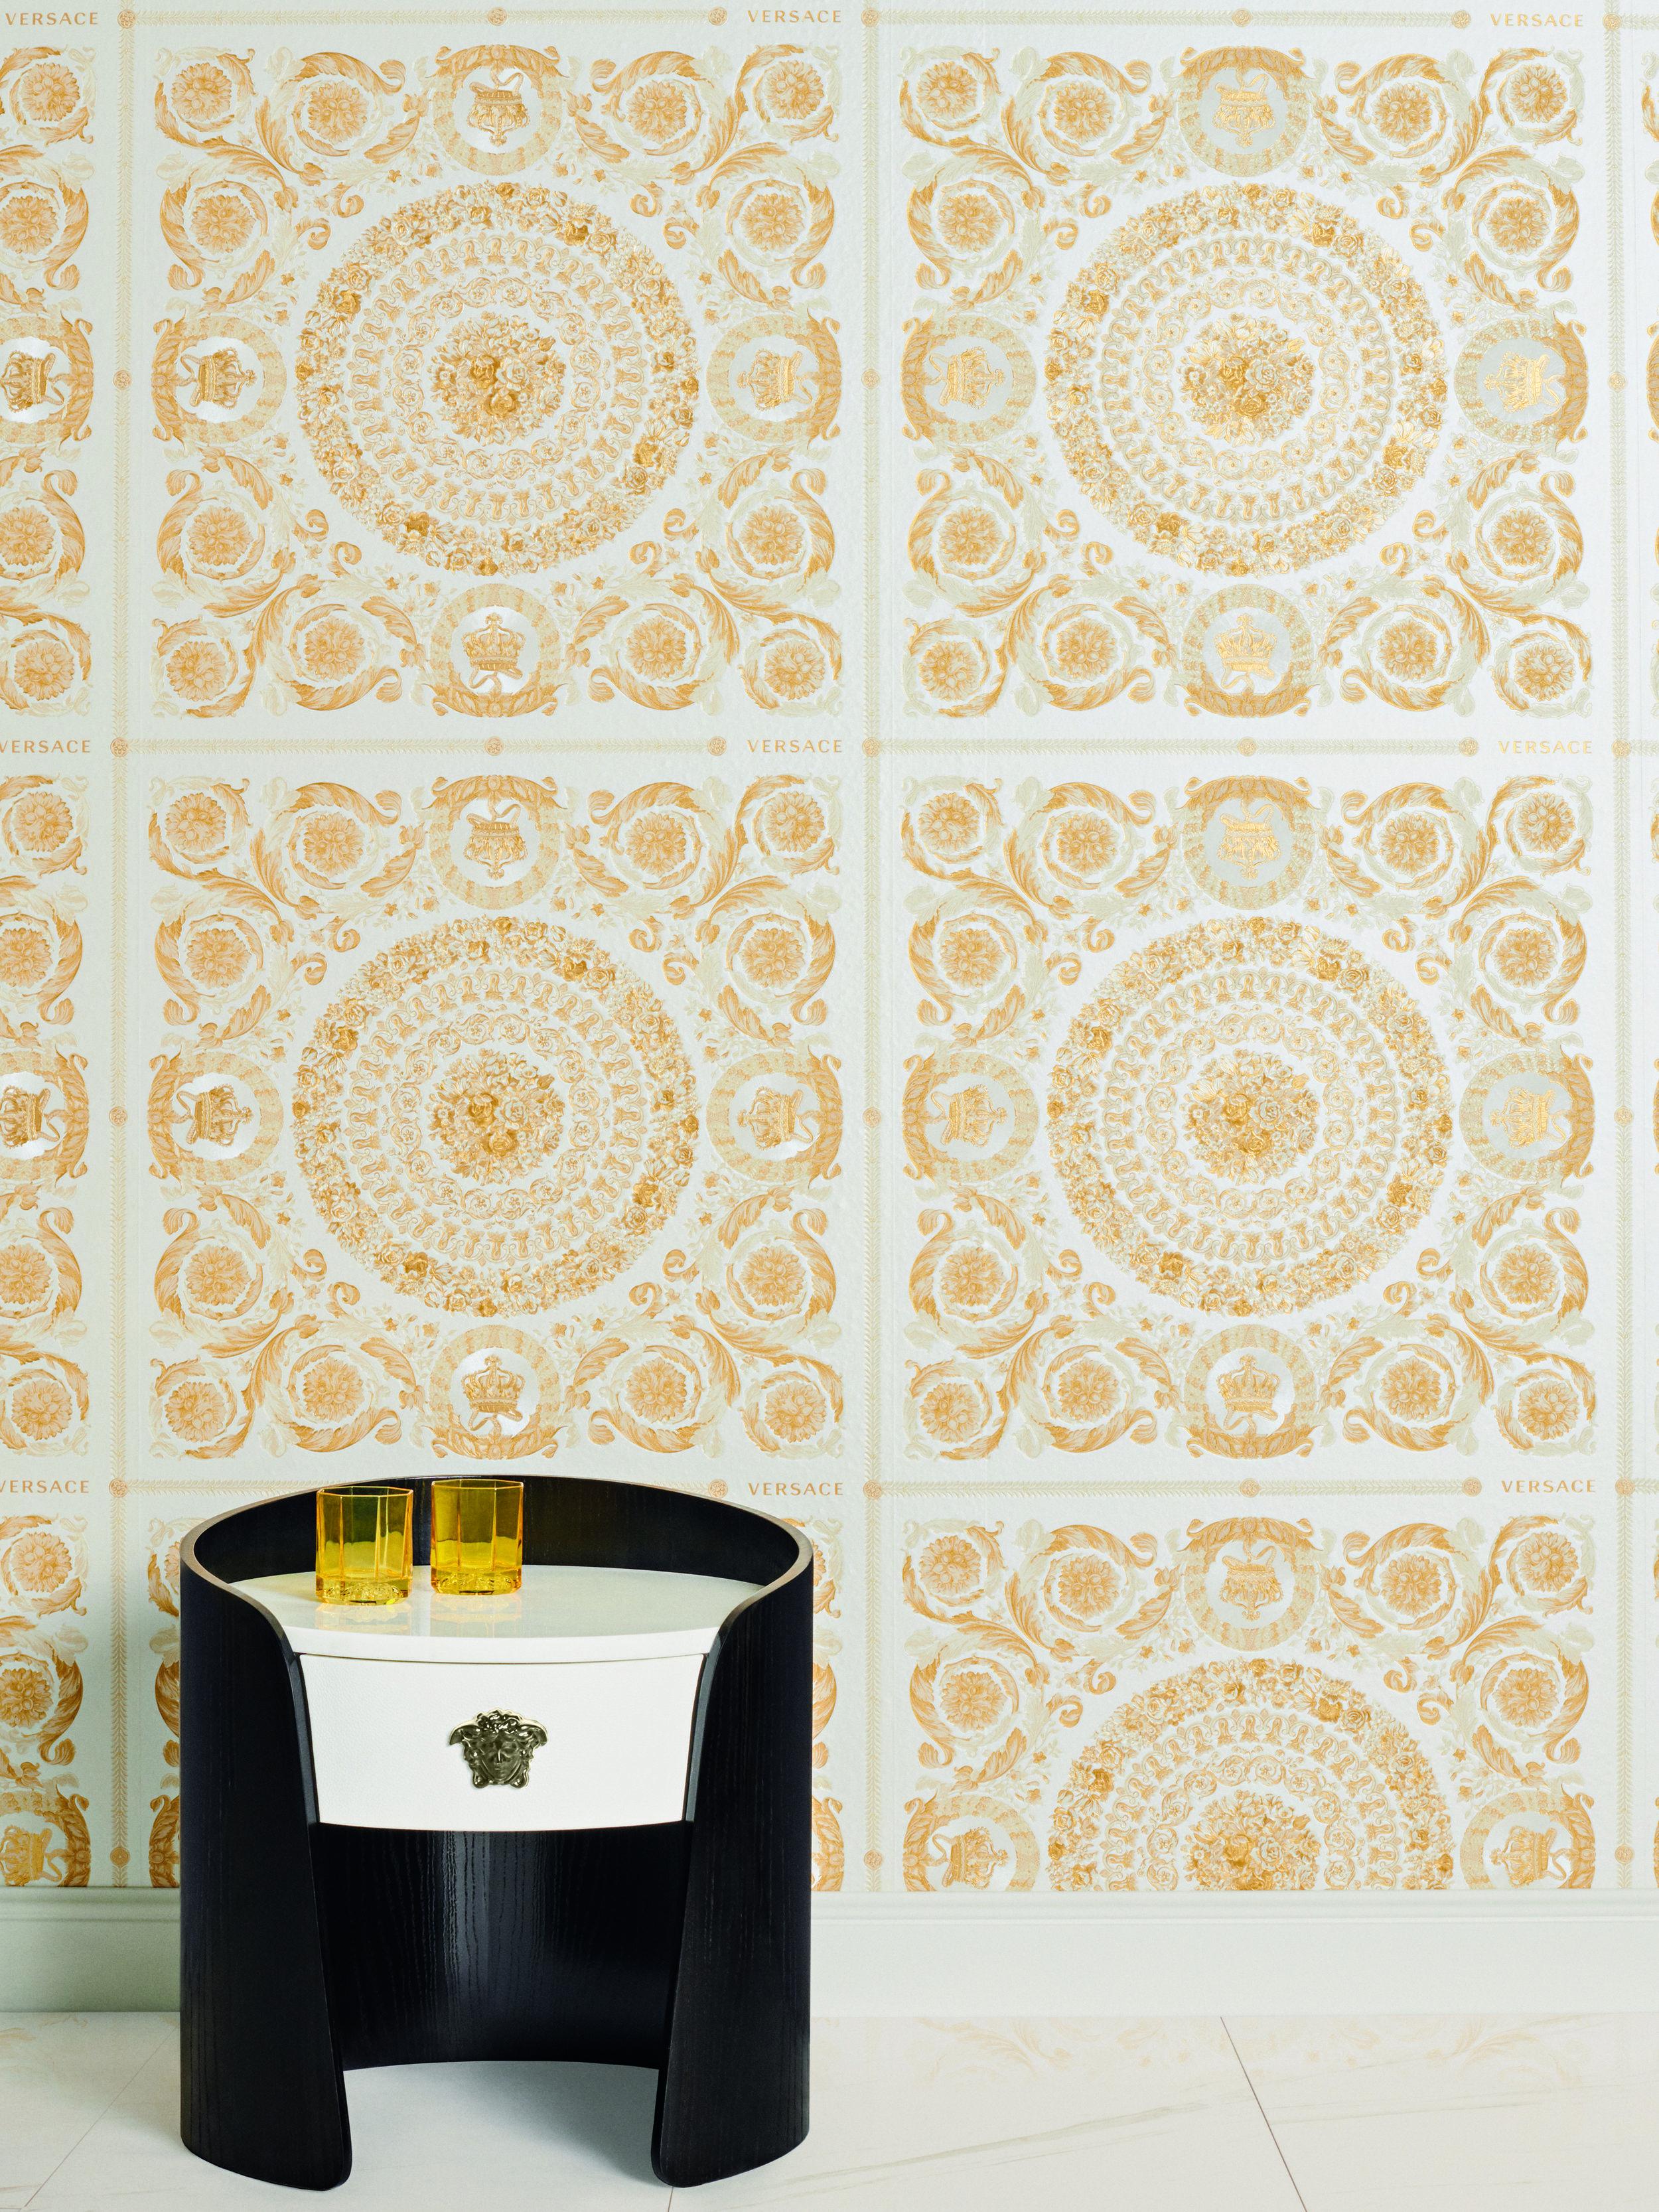 Versace IV Heritage Cream and Gold Wallpaper Cream